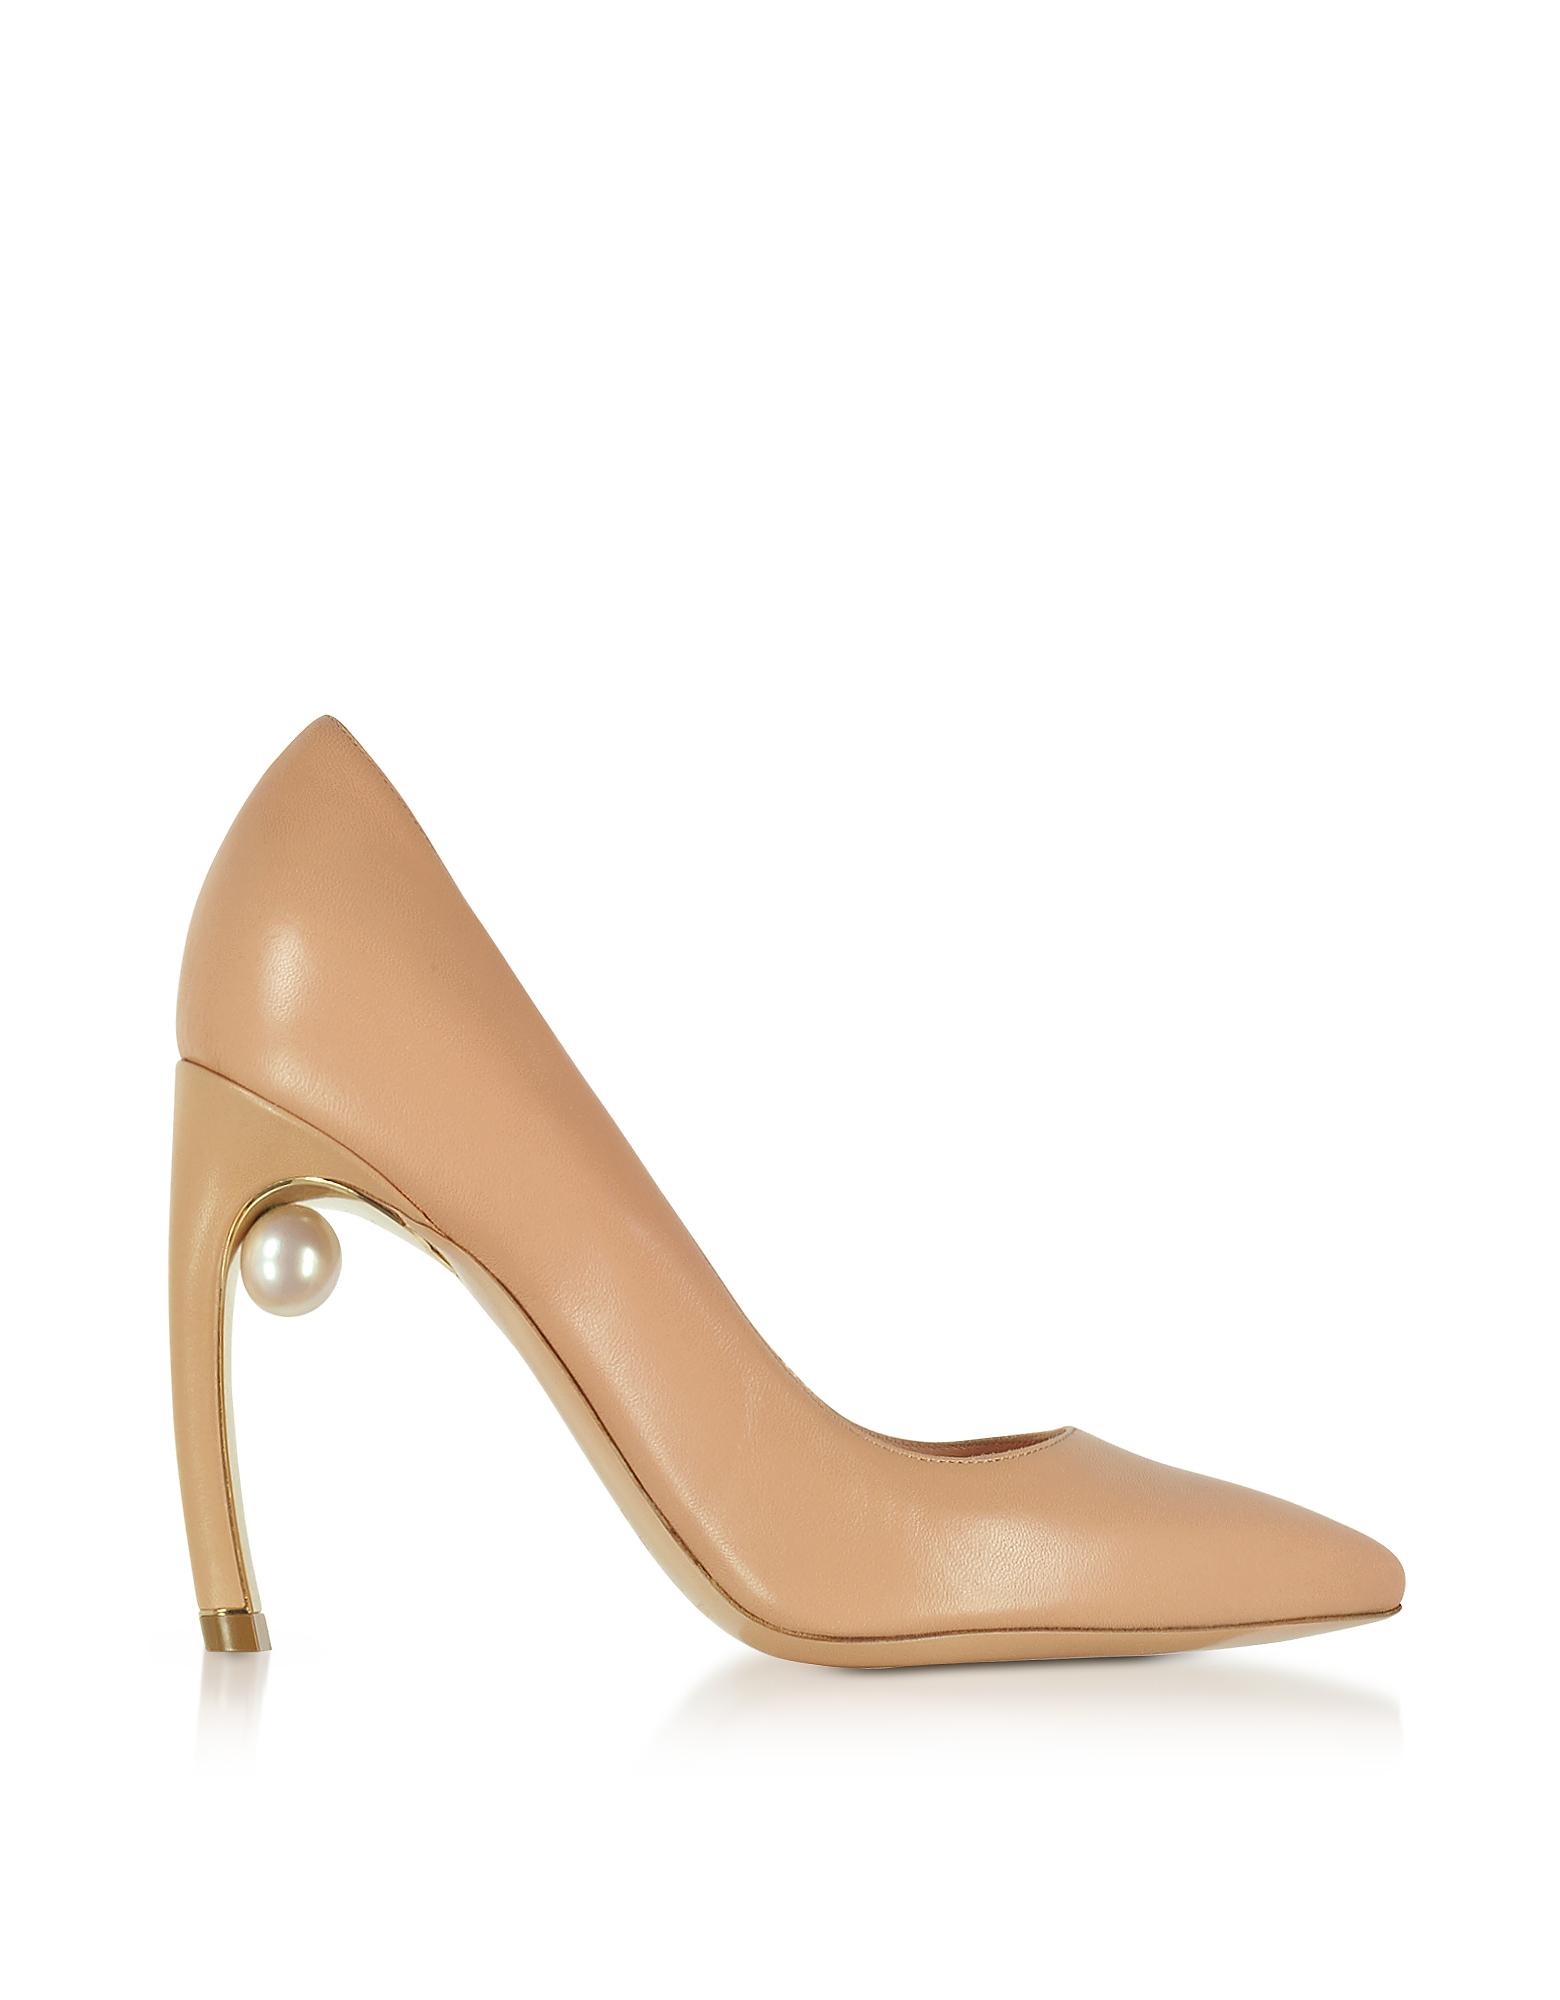 Nicholas Kirkwood Shoes, Nude Nappa Leather Mira Pearl Pumps